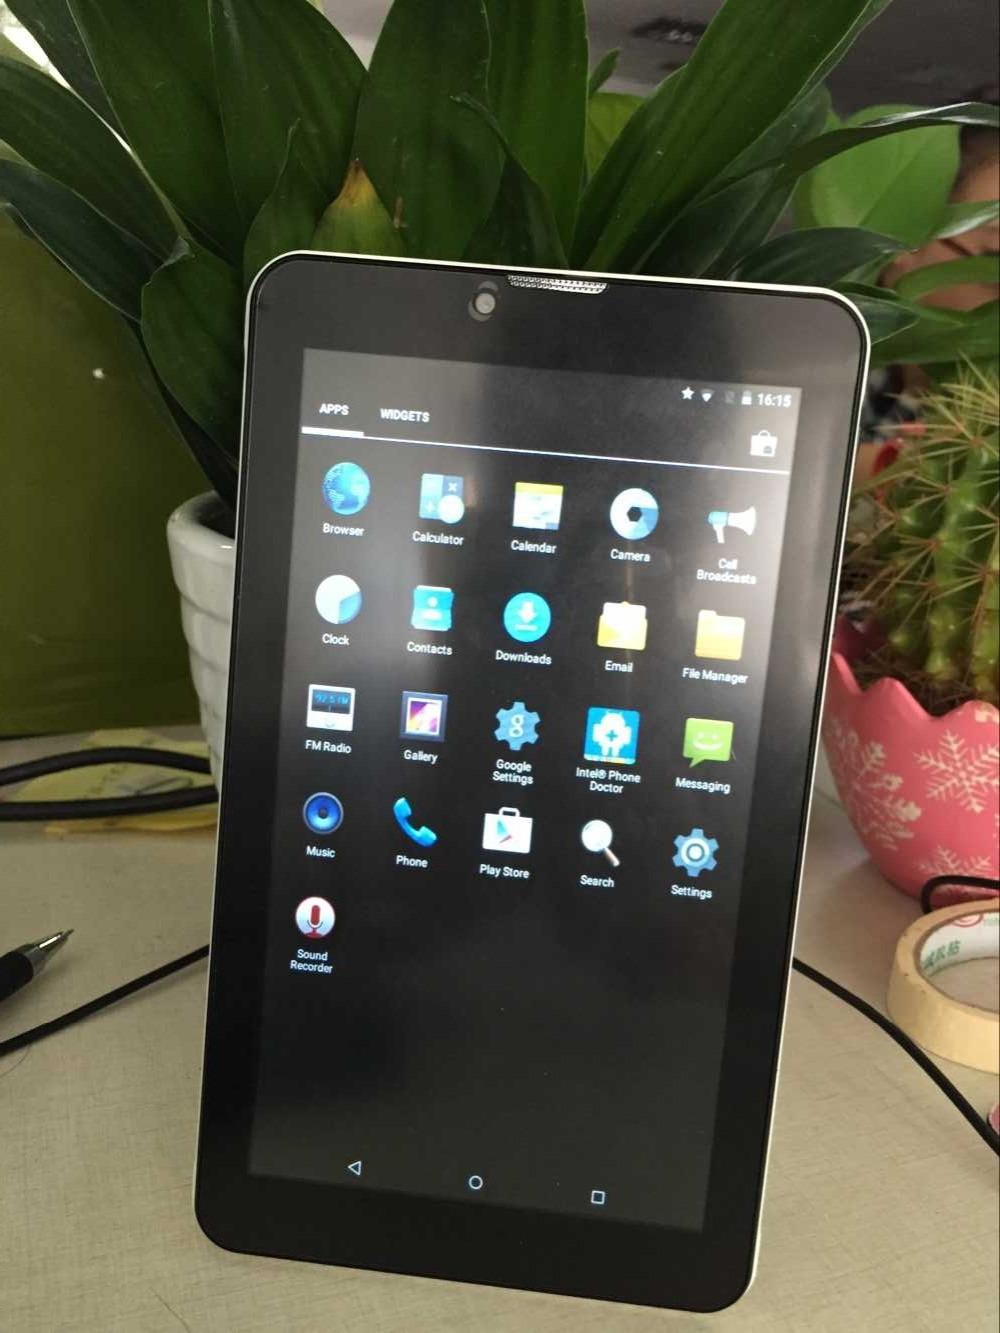 7 inch Chuwi Vi7 3G Phone Call Android 5 1 Lollipop Tablet pc Intel SoFIA Atom